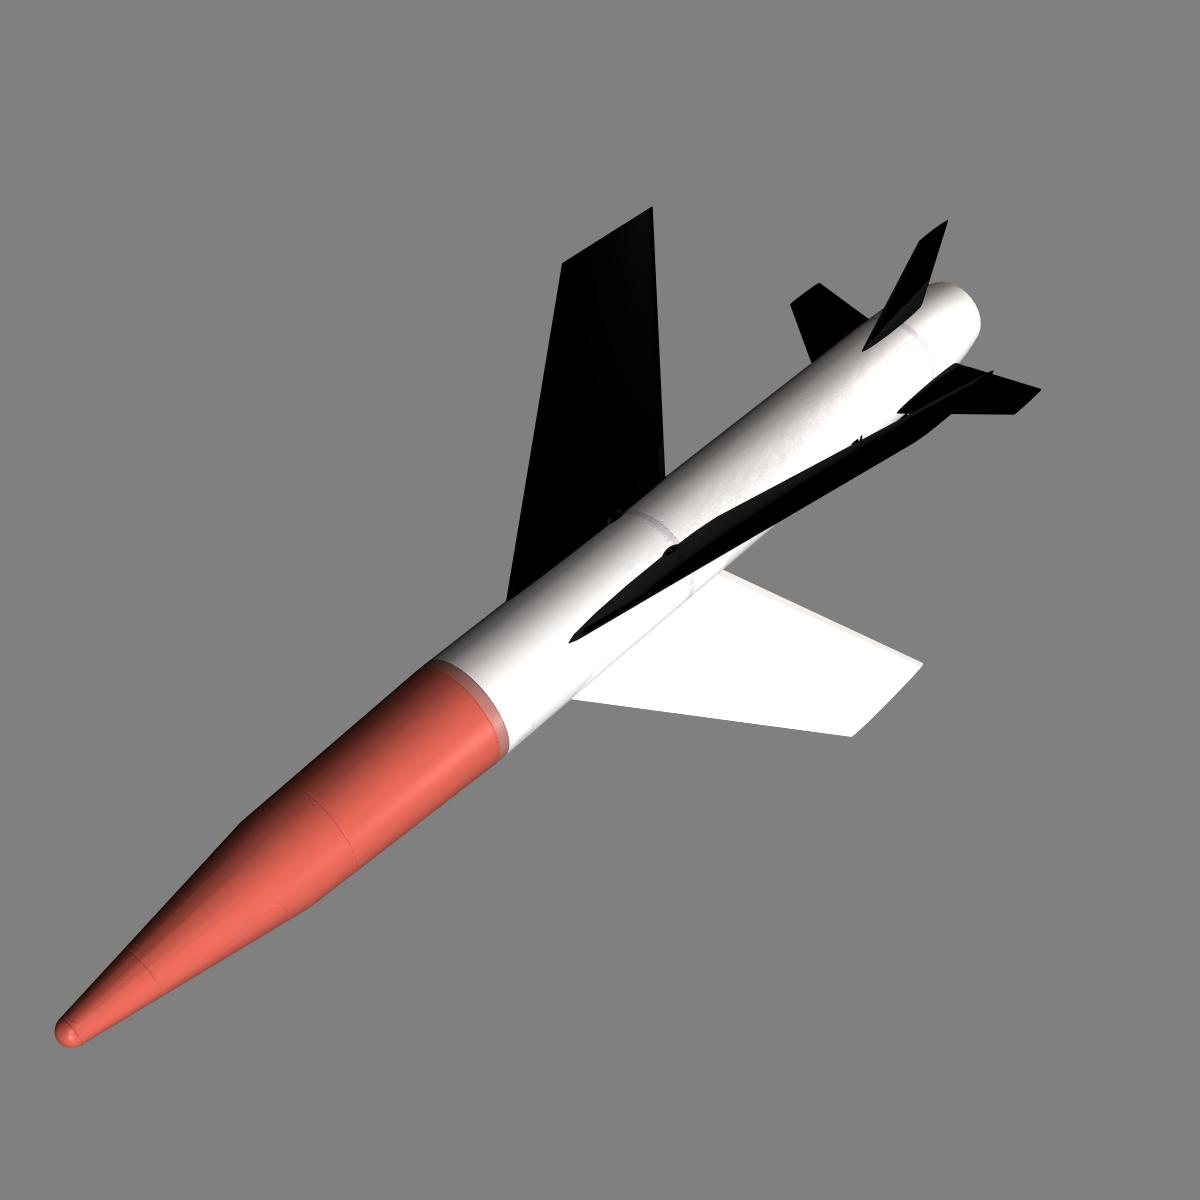 us mgm-18a raketa za lakros 3d model 3ds dxf cob x drugi obj 136517